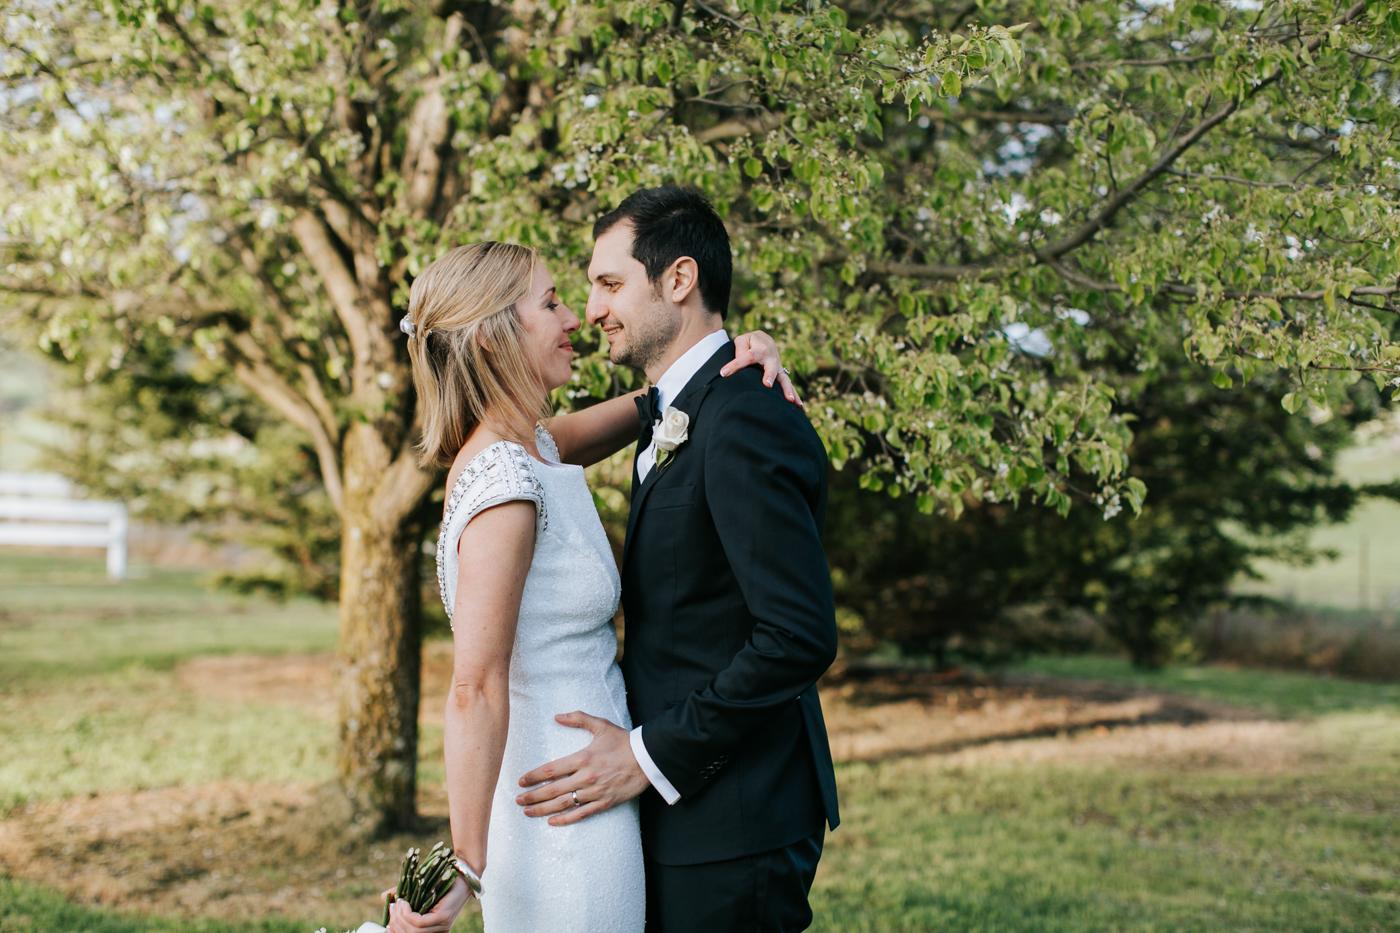 Bridget & James - Orange Country Wedding - Samantha Heather Photography-120.jpg